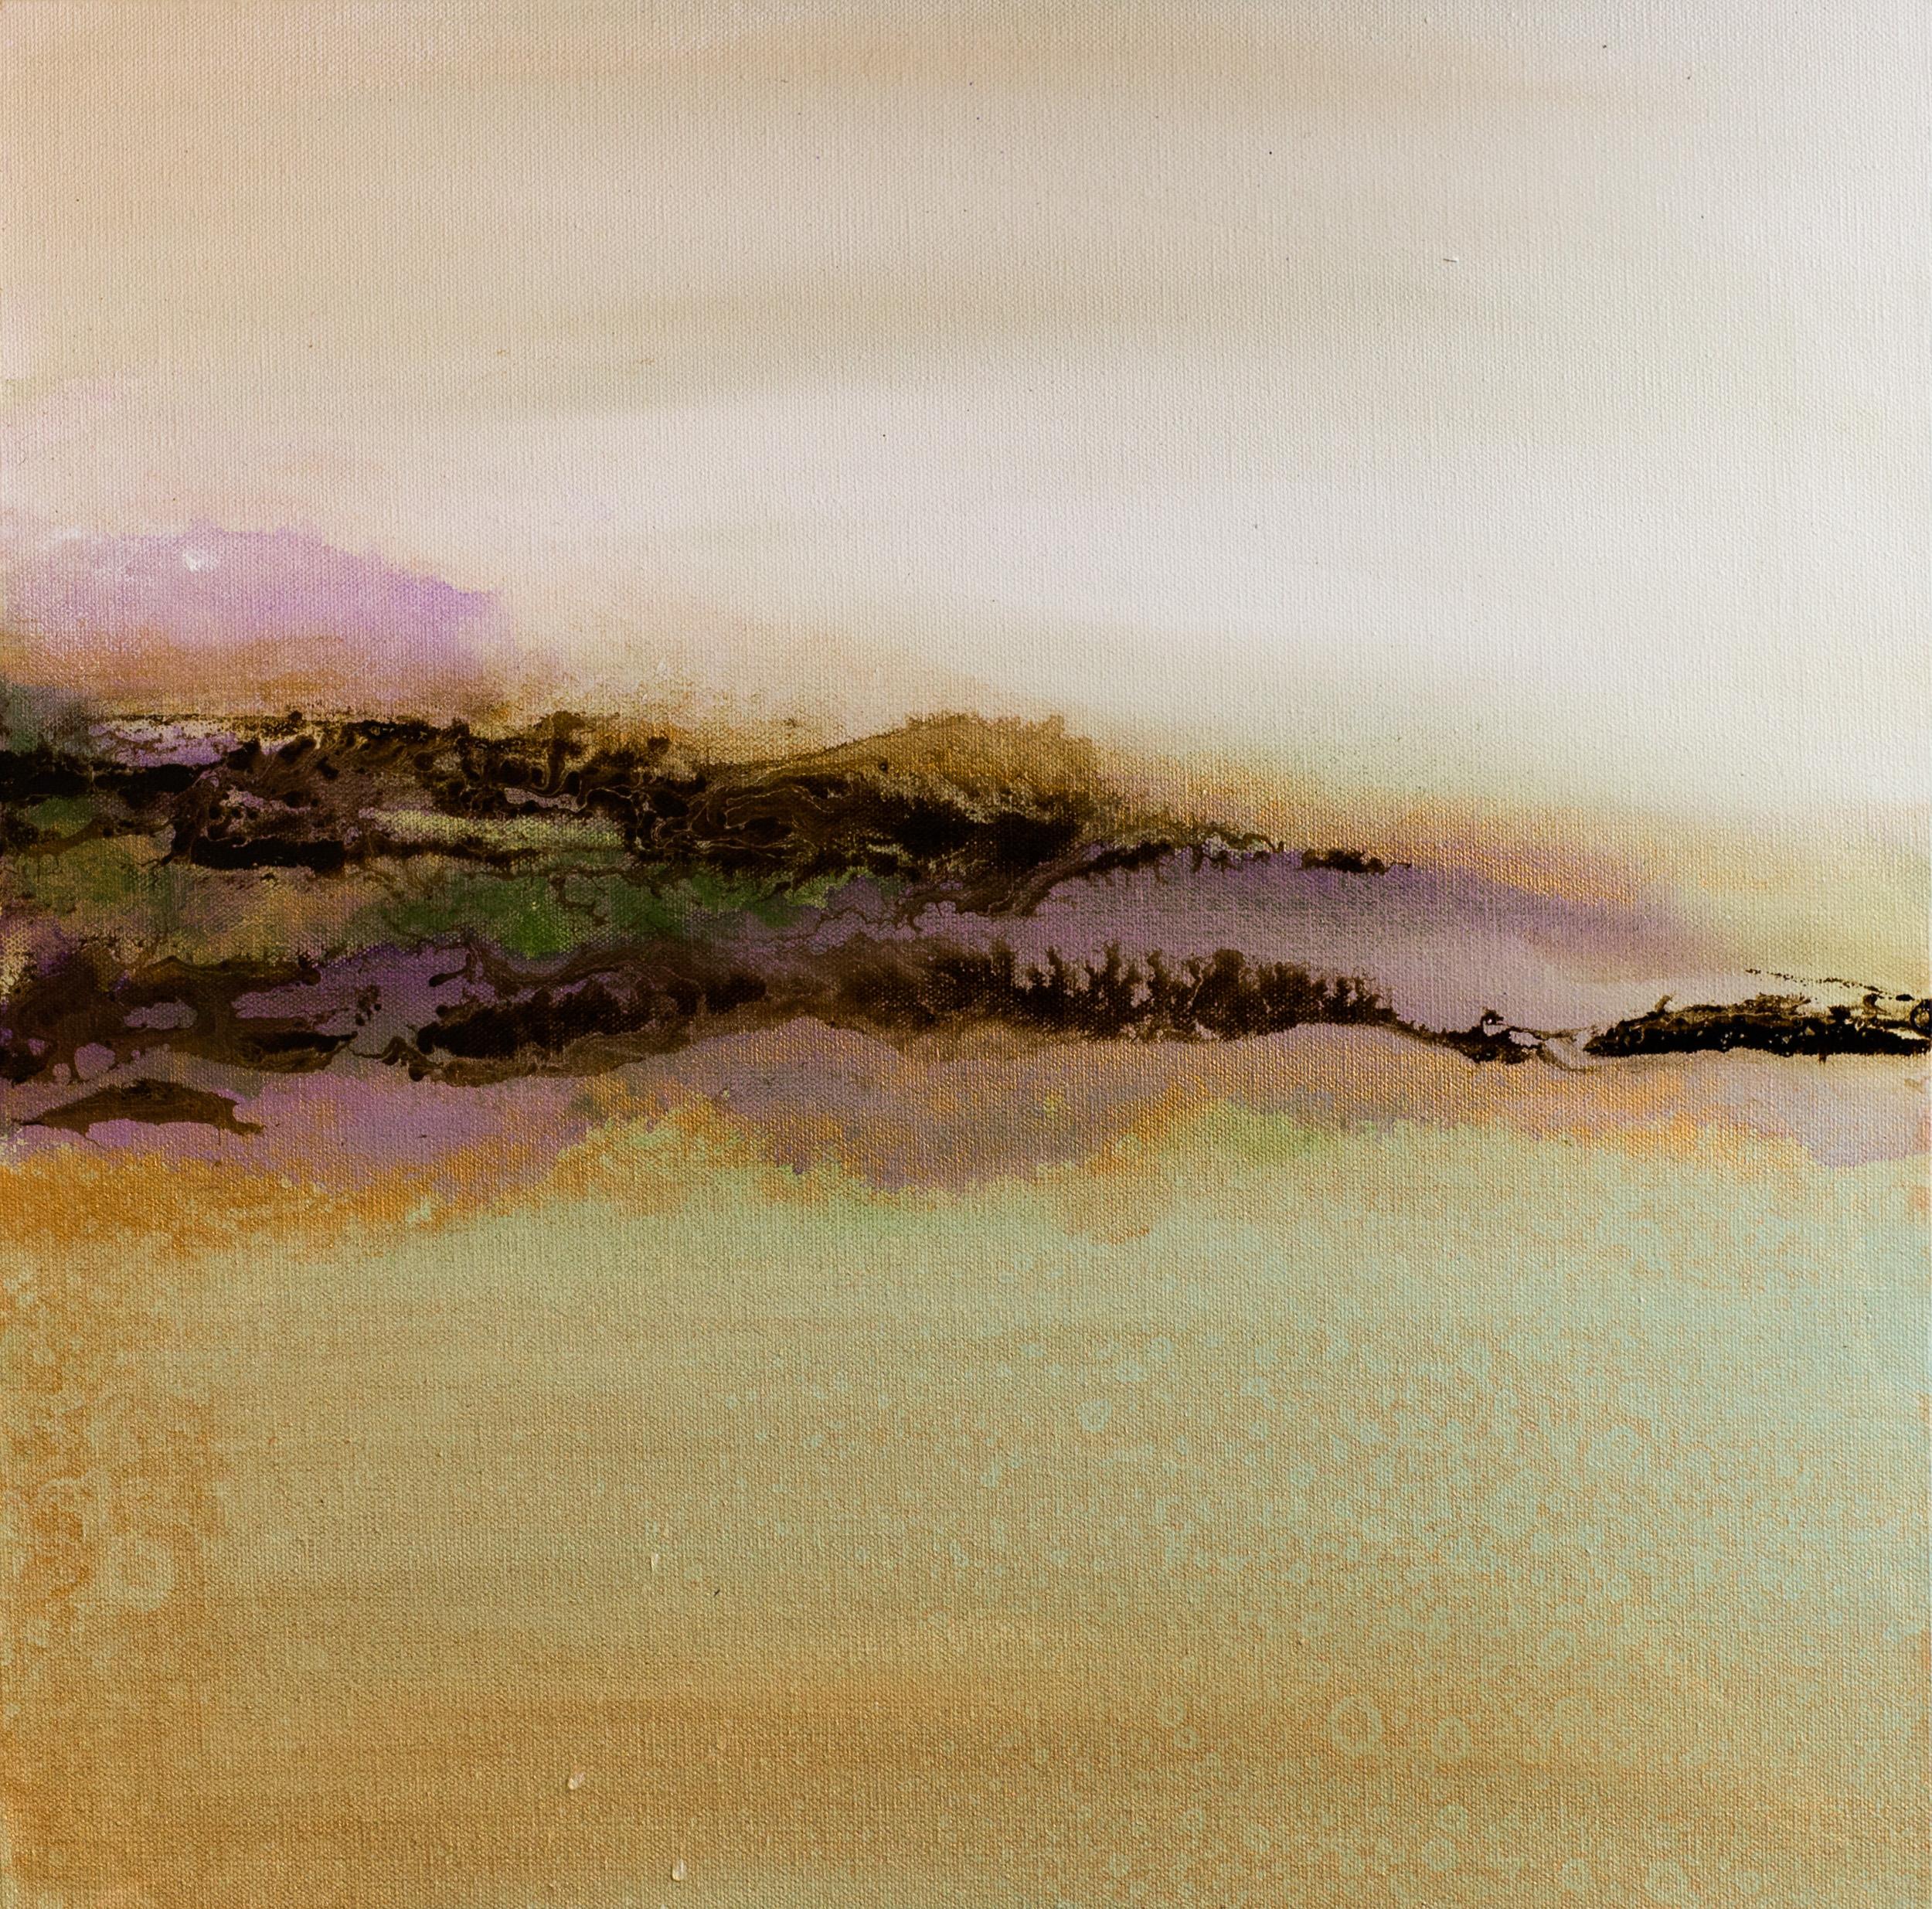 """Lavender Hills"" 20x20"